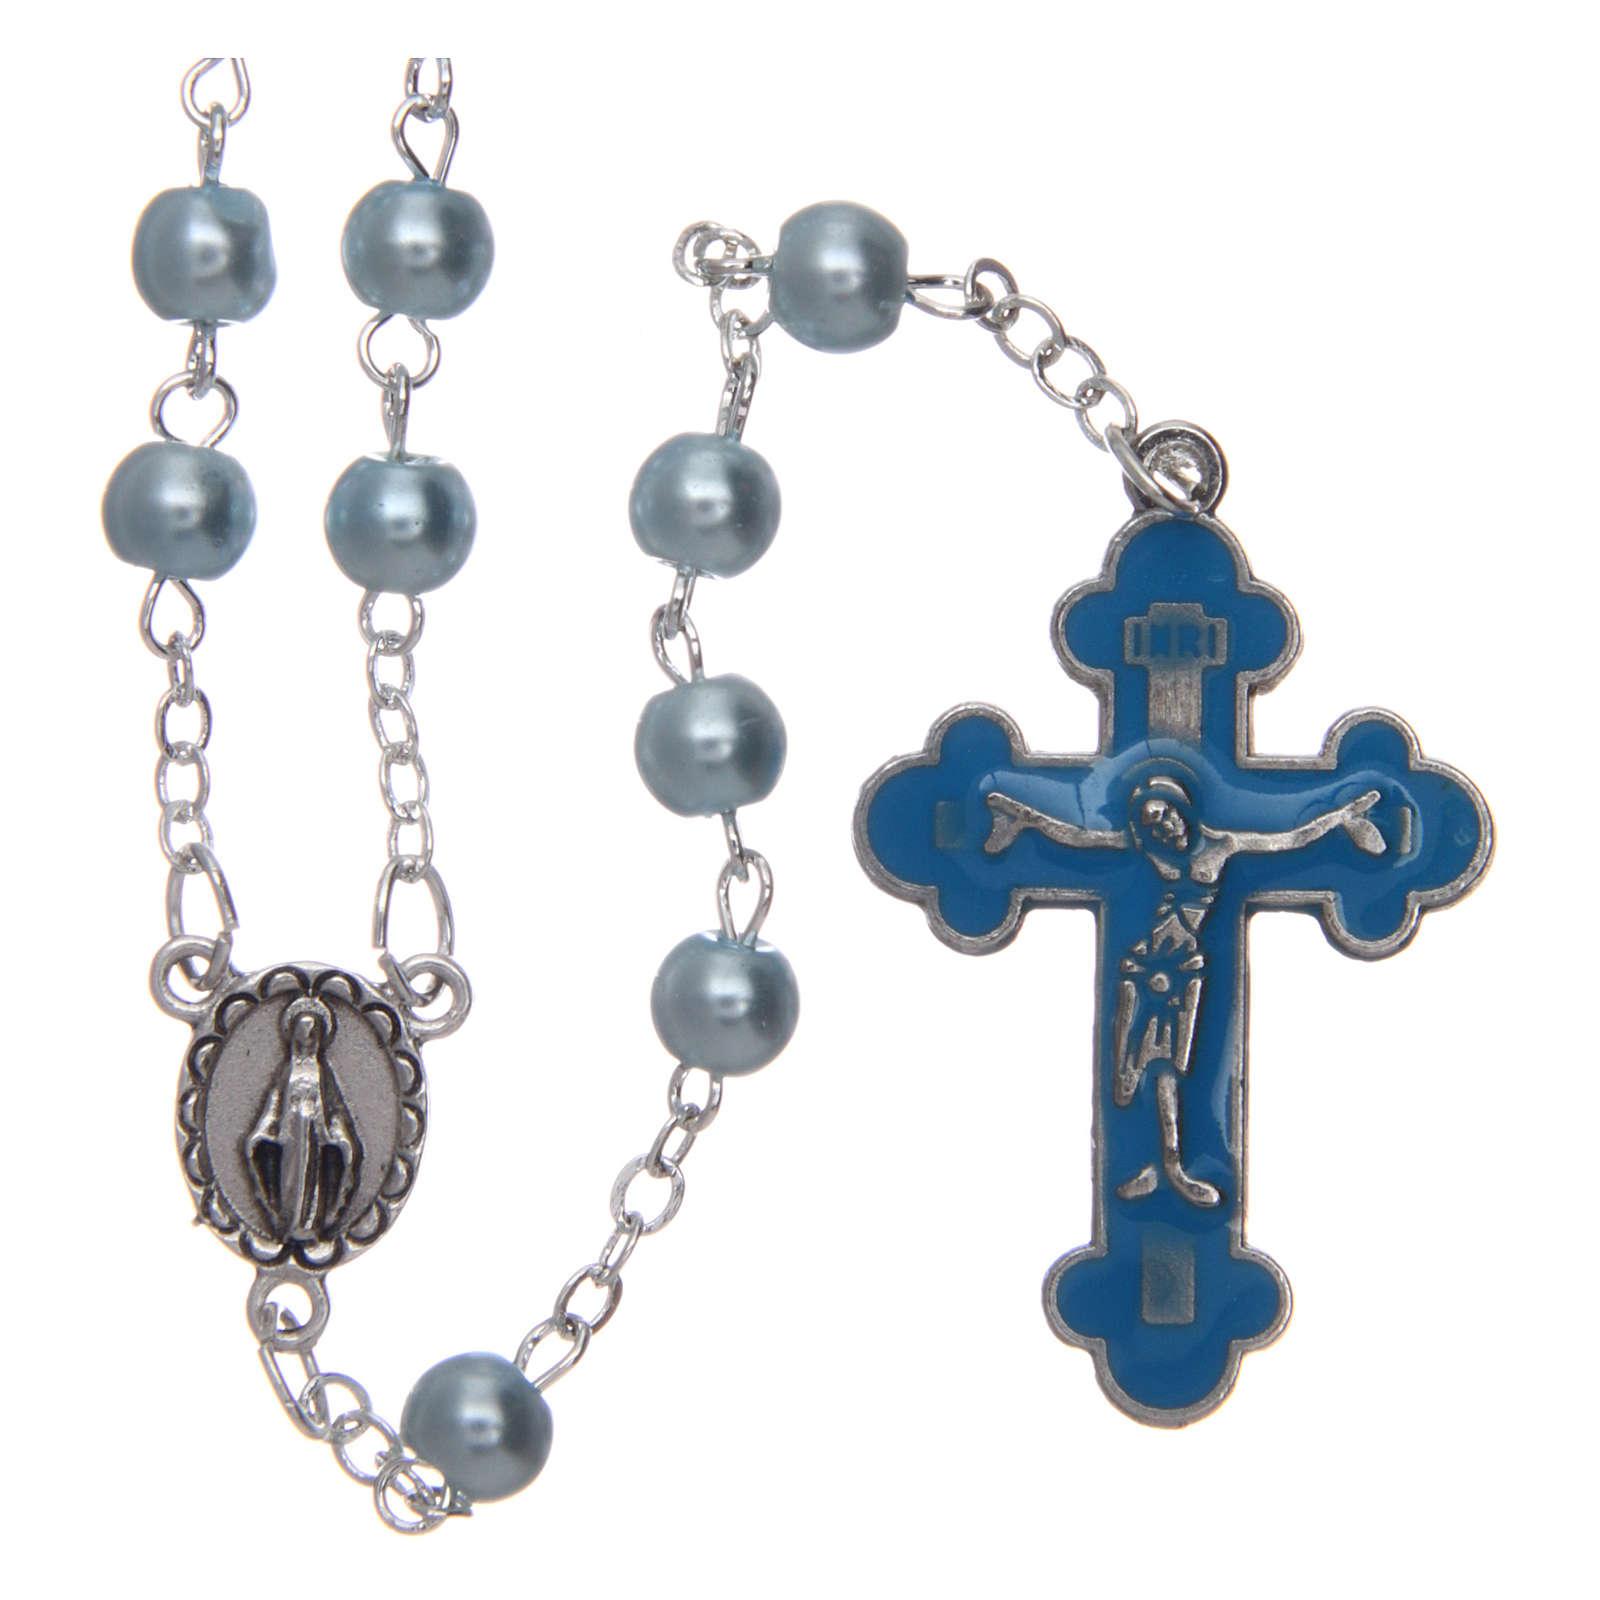 Rosario simil perla redondo azul 5 mm cruz esmaltada 4